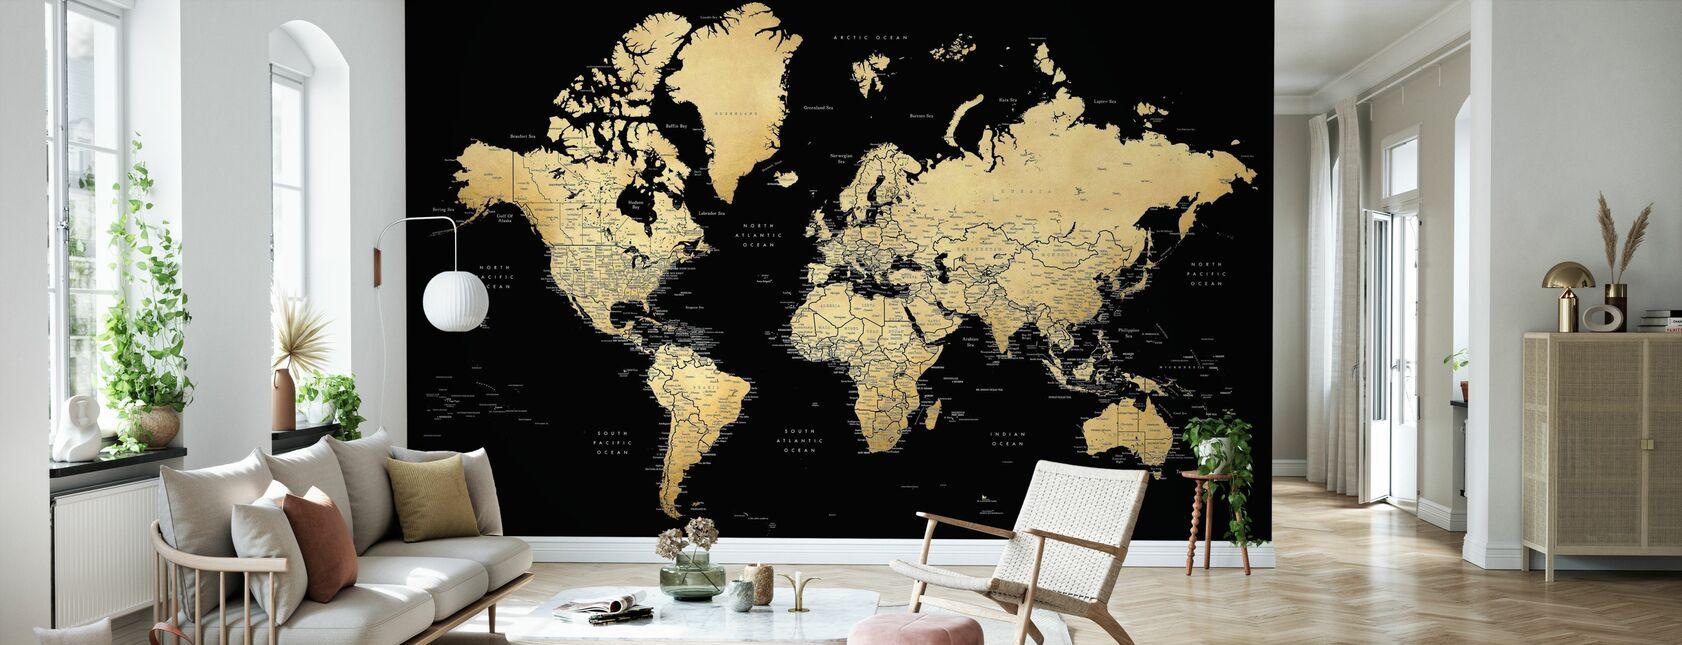 Wereldkaart met steden - Behang - Woonkamer